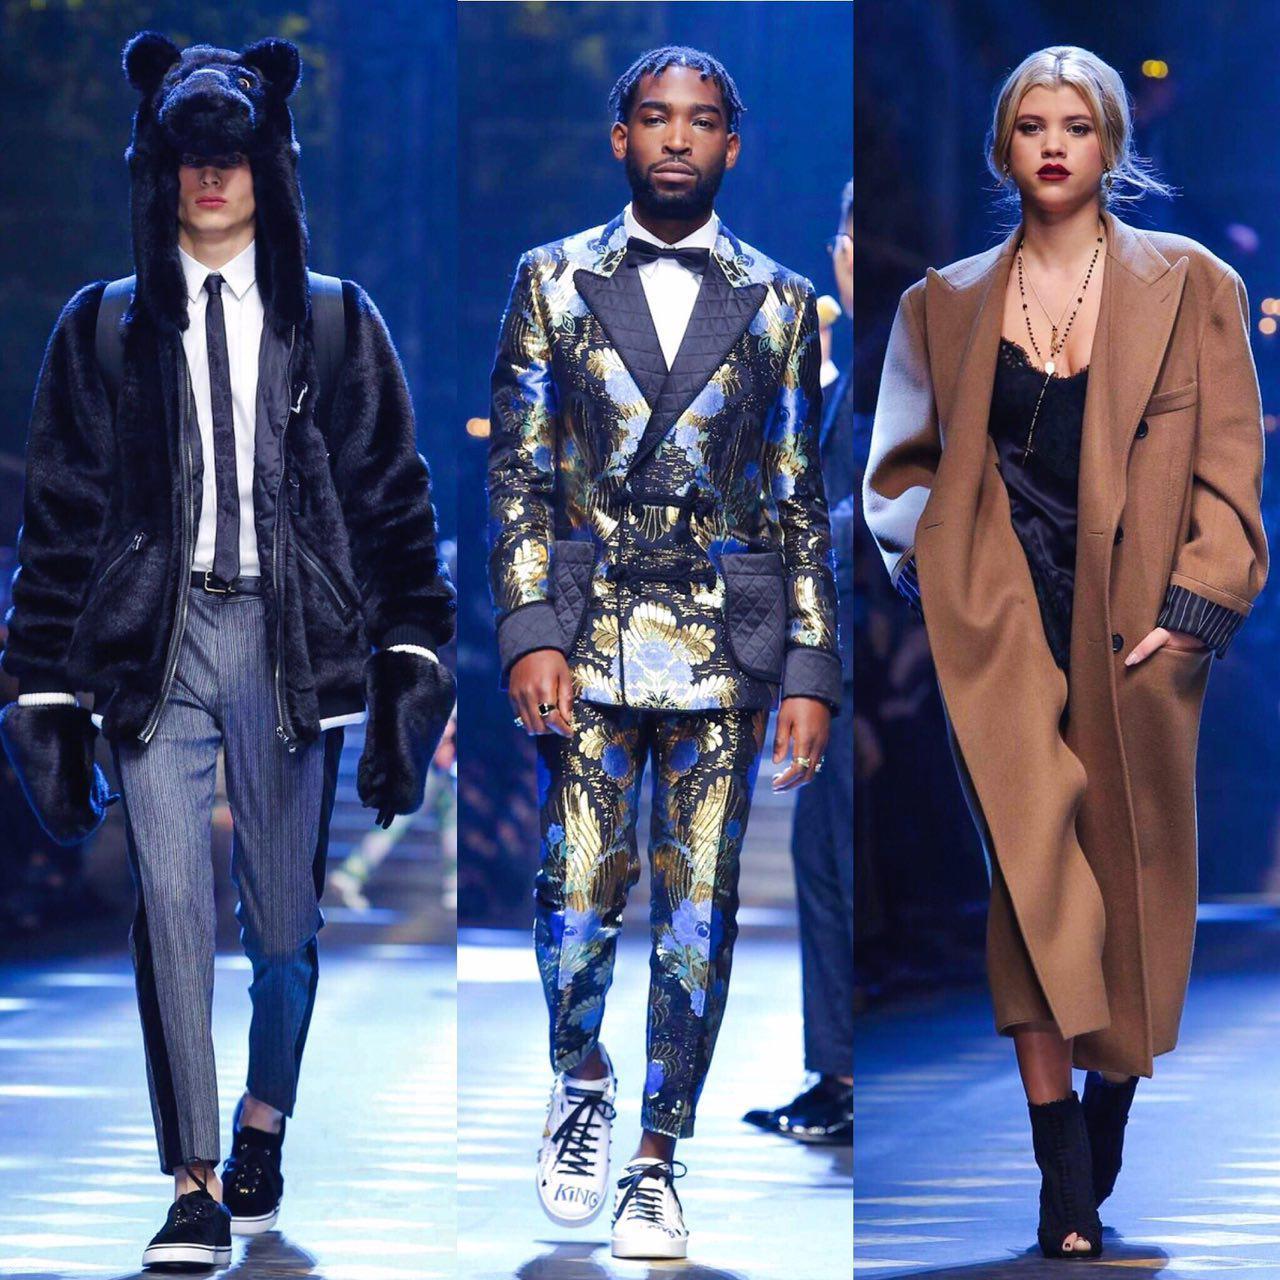 Tinie Tempah, Sofia Richie & Teddy Bears - Dolce & Gabbana Fall Winter 2017 - Milan